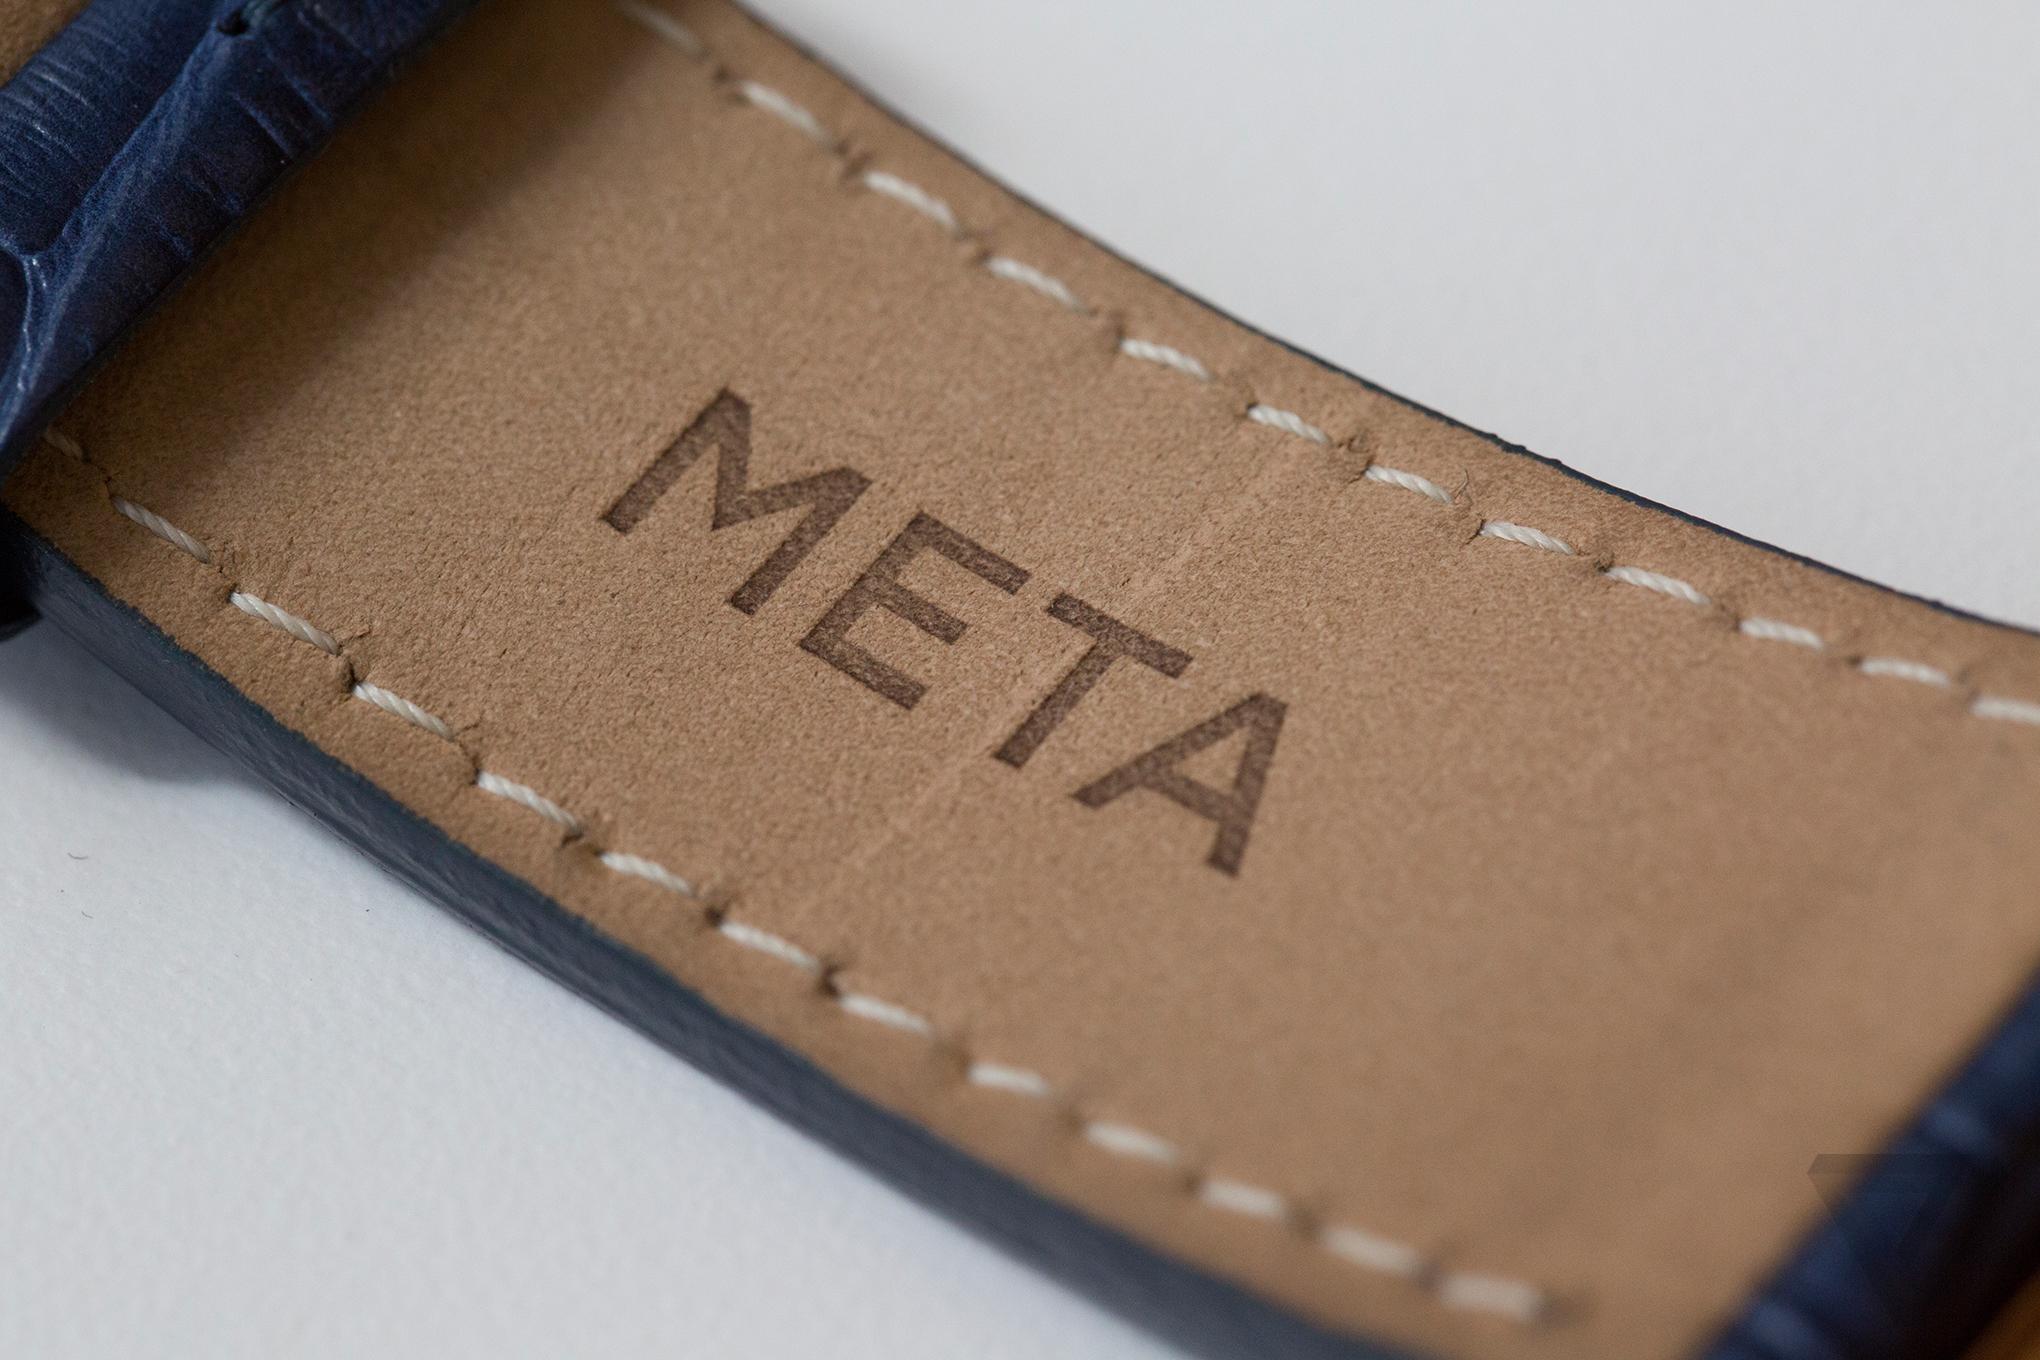 MetaWatch - Wikipedia